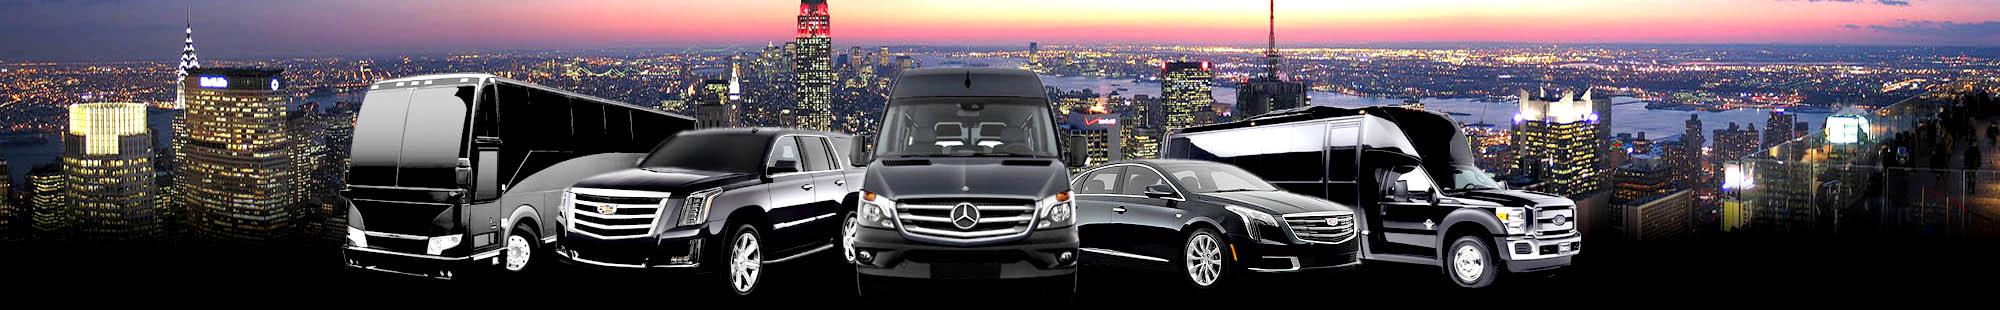 Long Island Mercedes Sprinter Transportation Coaches Li